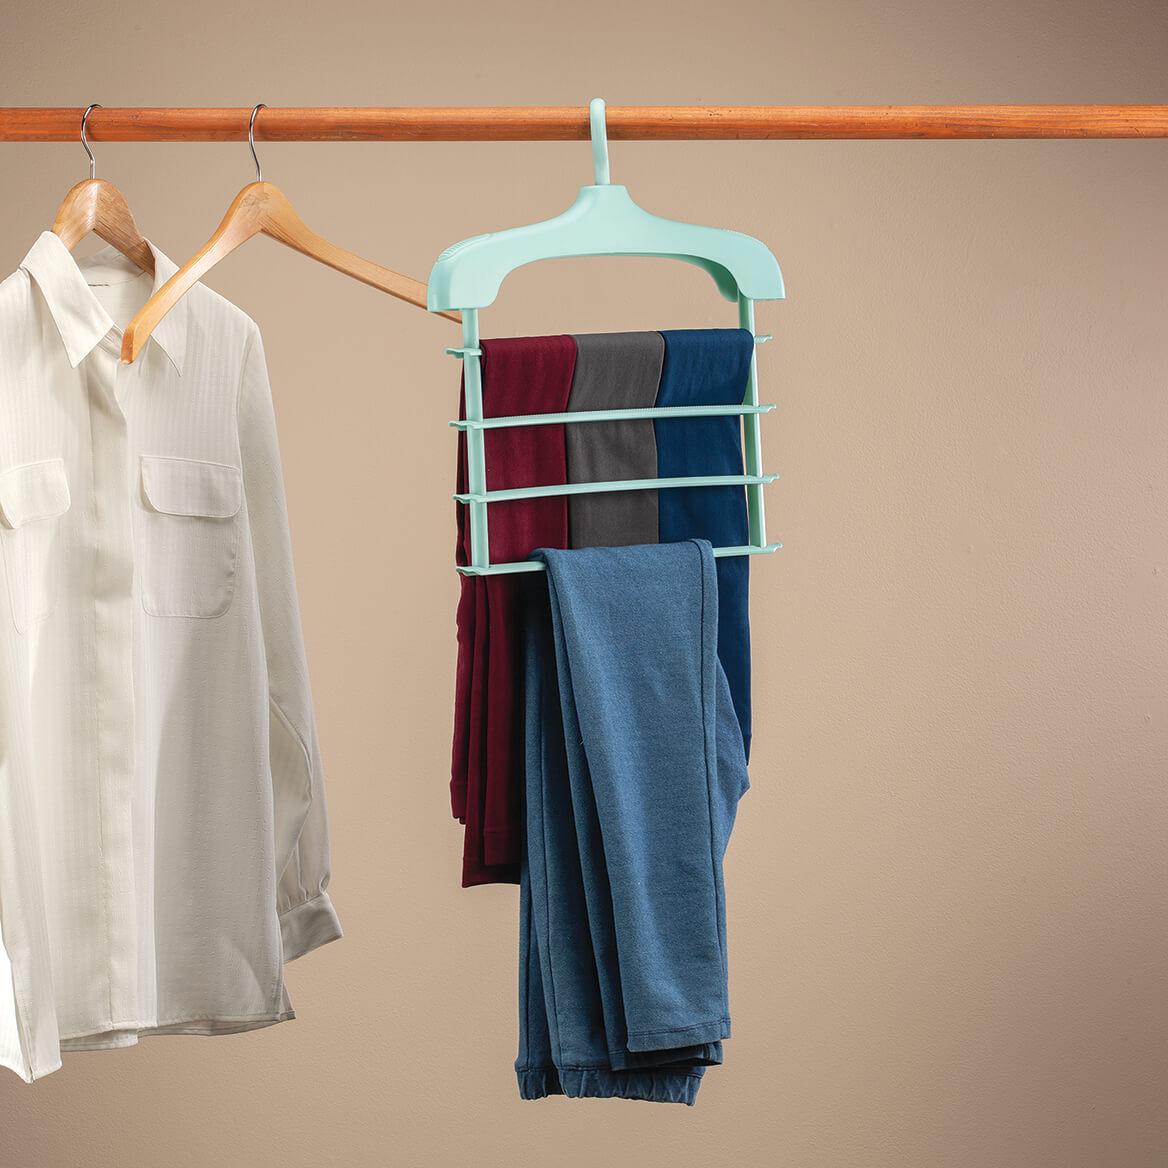 Stretch Pants Hanger-371221